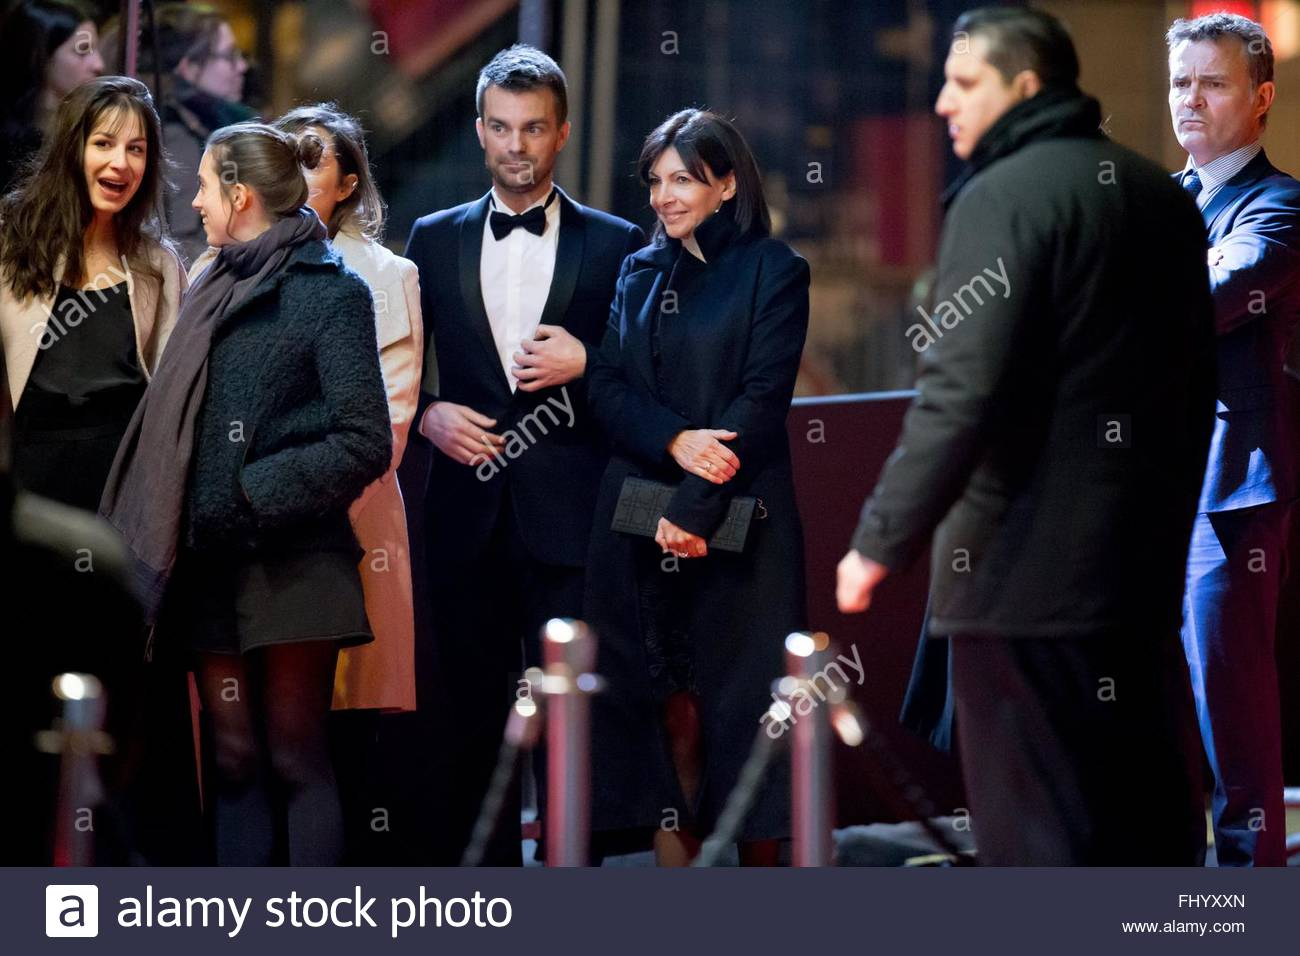 Paris, France. February 26th, 2016. FRANCE, Paris: Mayor of Paris Anne Hidalgo (3rdR) walks on the red carpet of Stock Photo